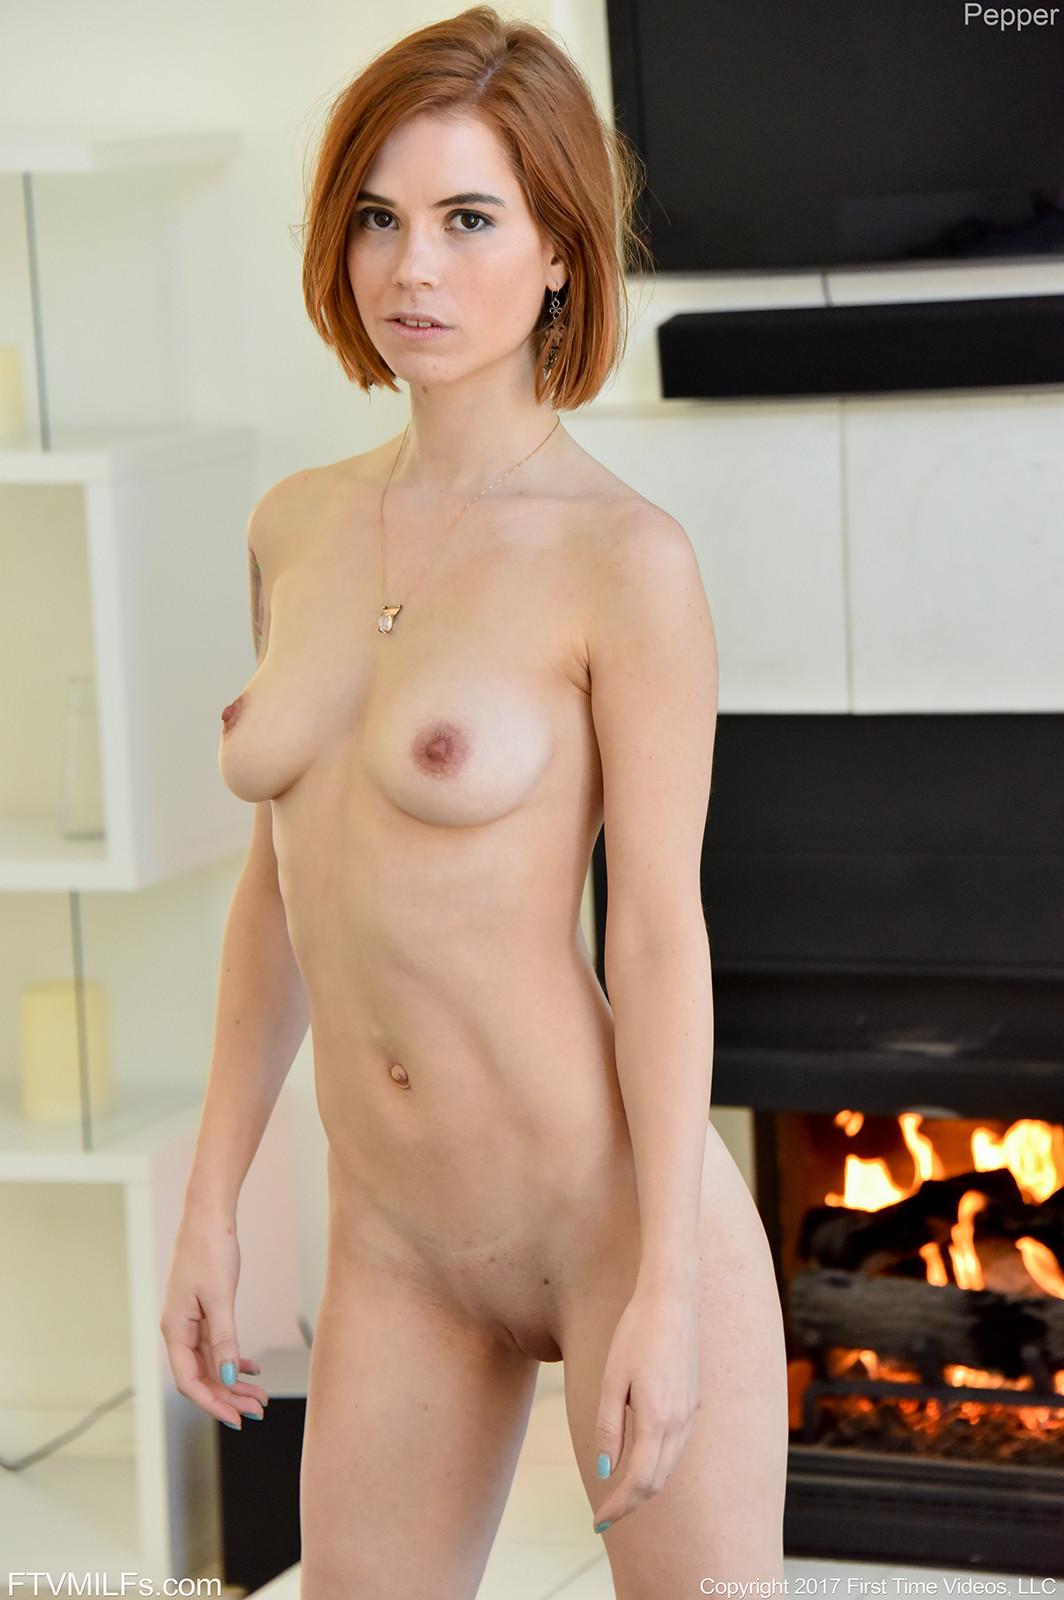 Pretty southern girls naked